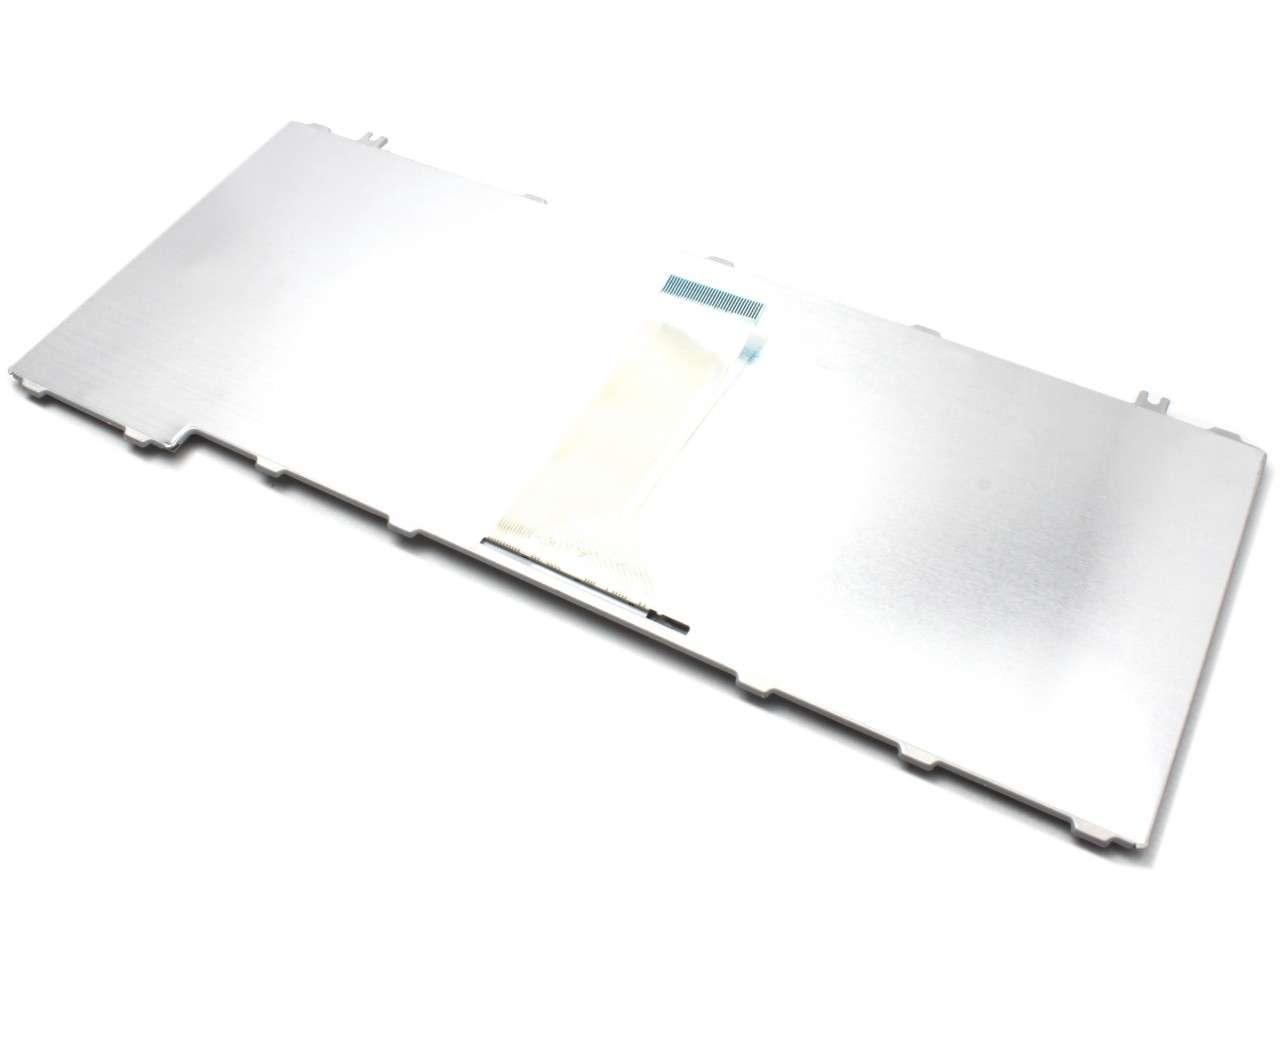 Tastatura Toshiba Satellite M505 Alba imagine powerlaptop.ro 2021